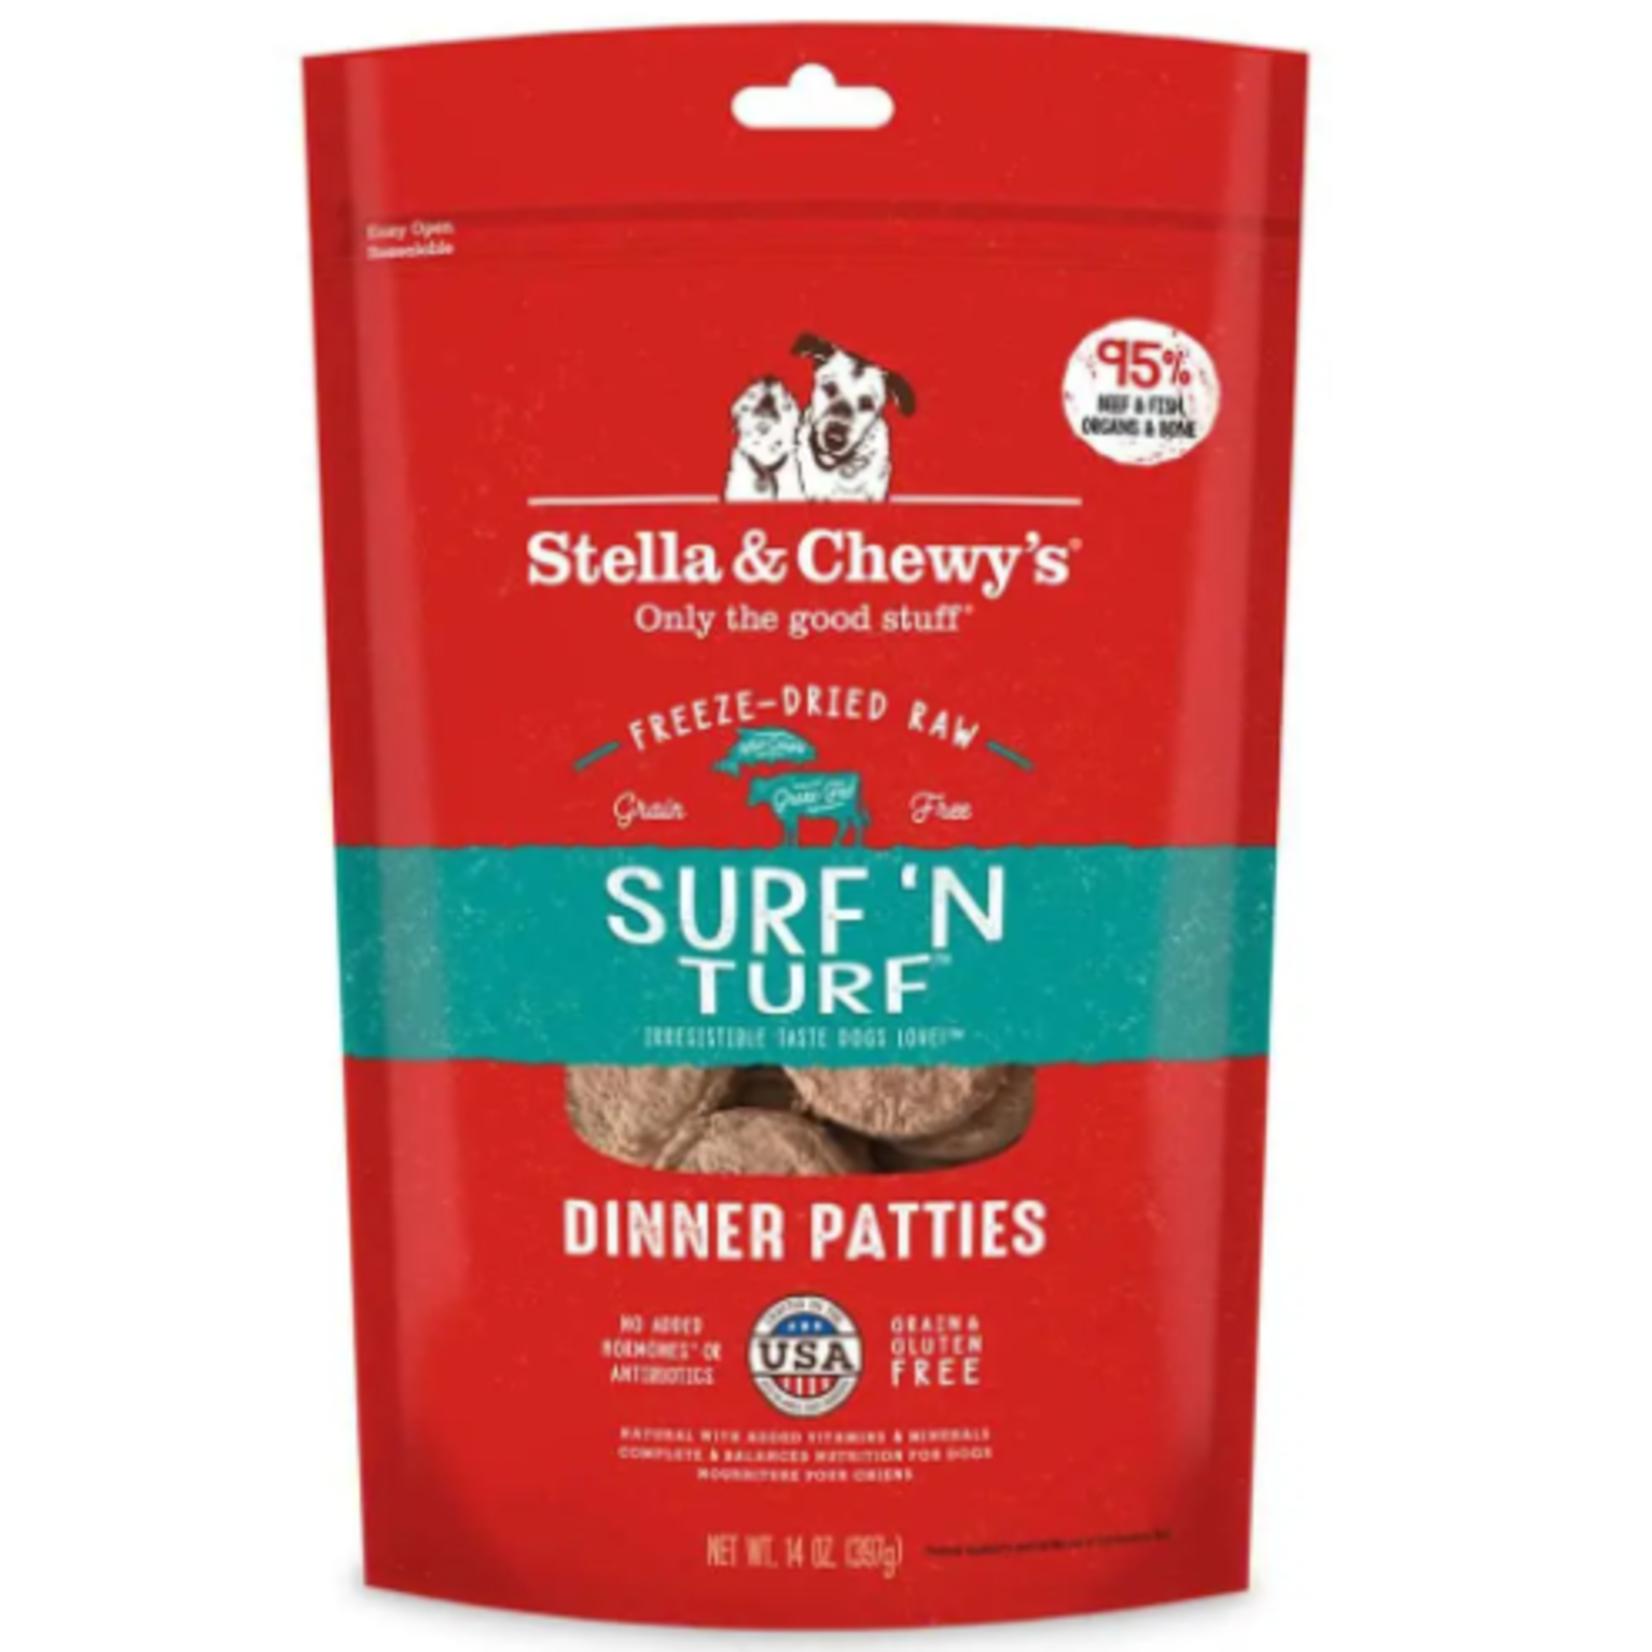 Stella & Chewy s Cru séché à froid- Galettes de dîner Surf'N Turf - 5.5 oz